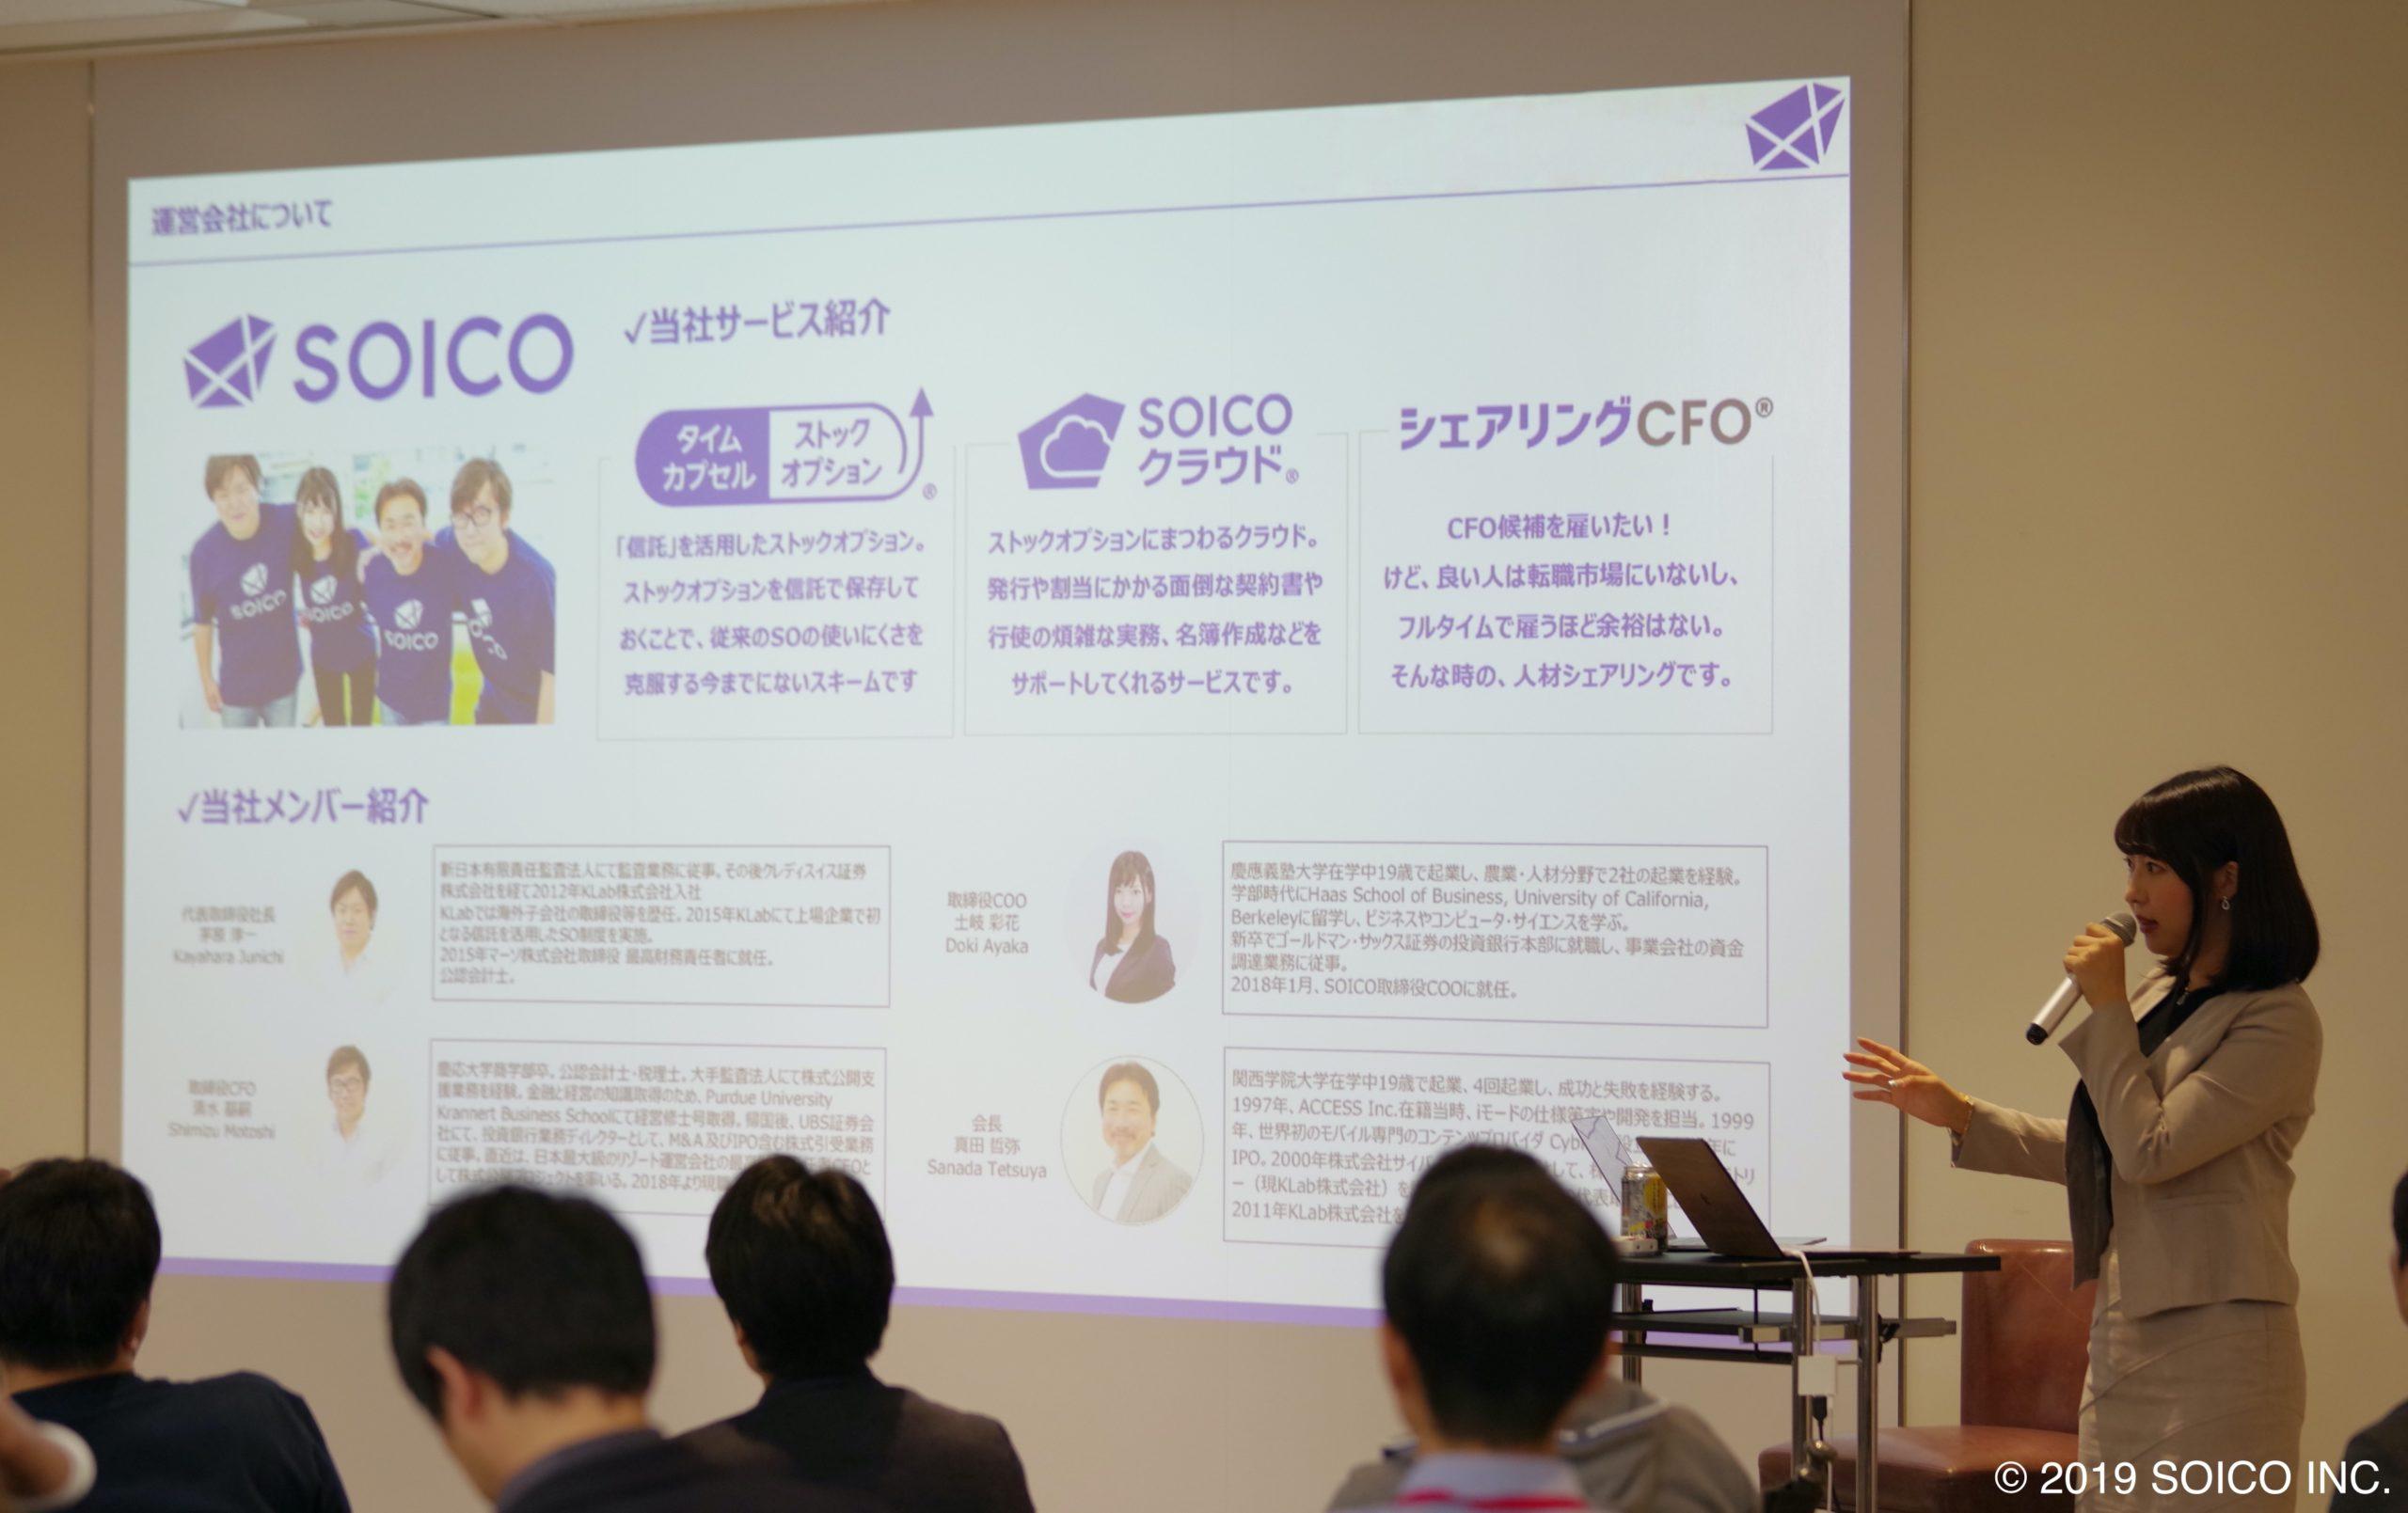 SOICO株式会社のサービスとミッション